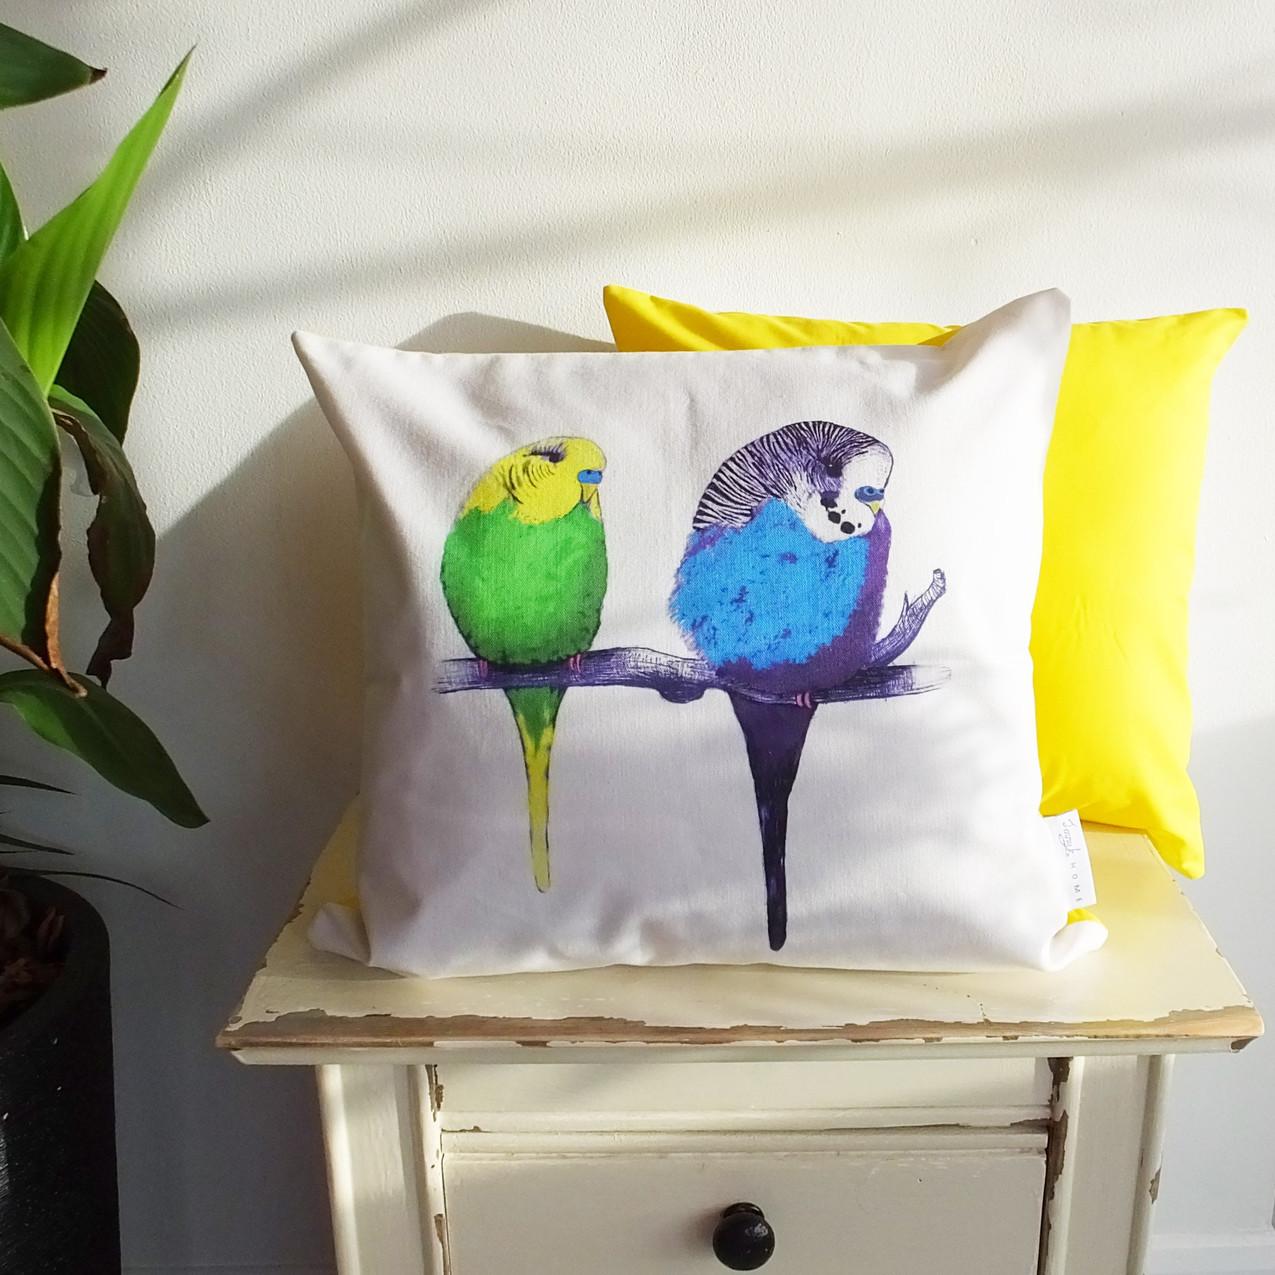 Jenny K Home Yellow Budgie Cushion Too Cute 1-min